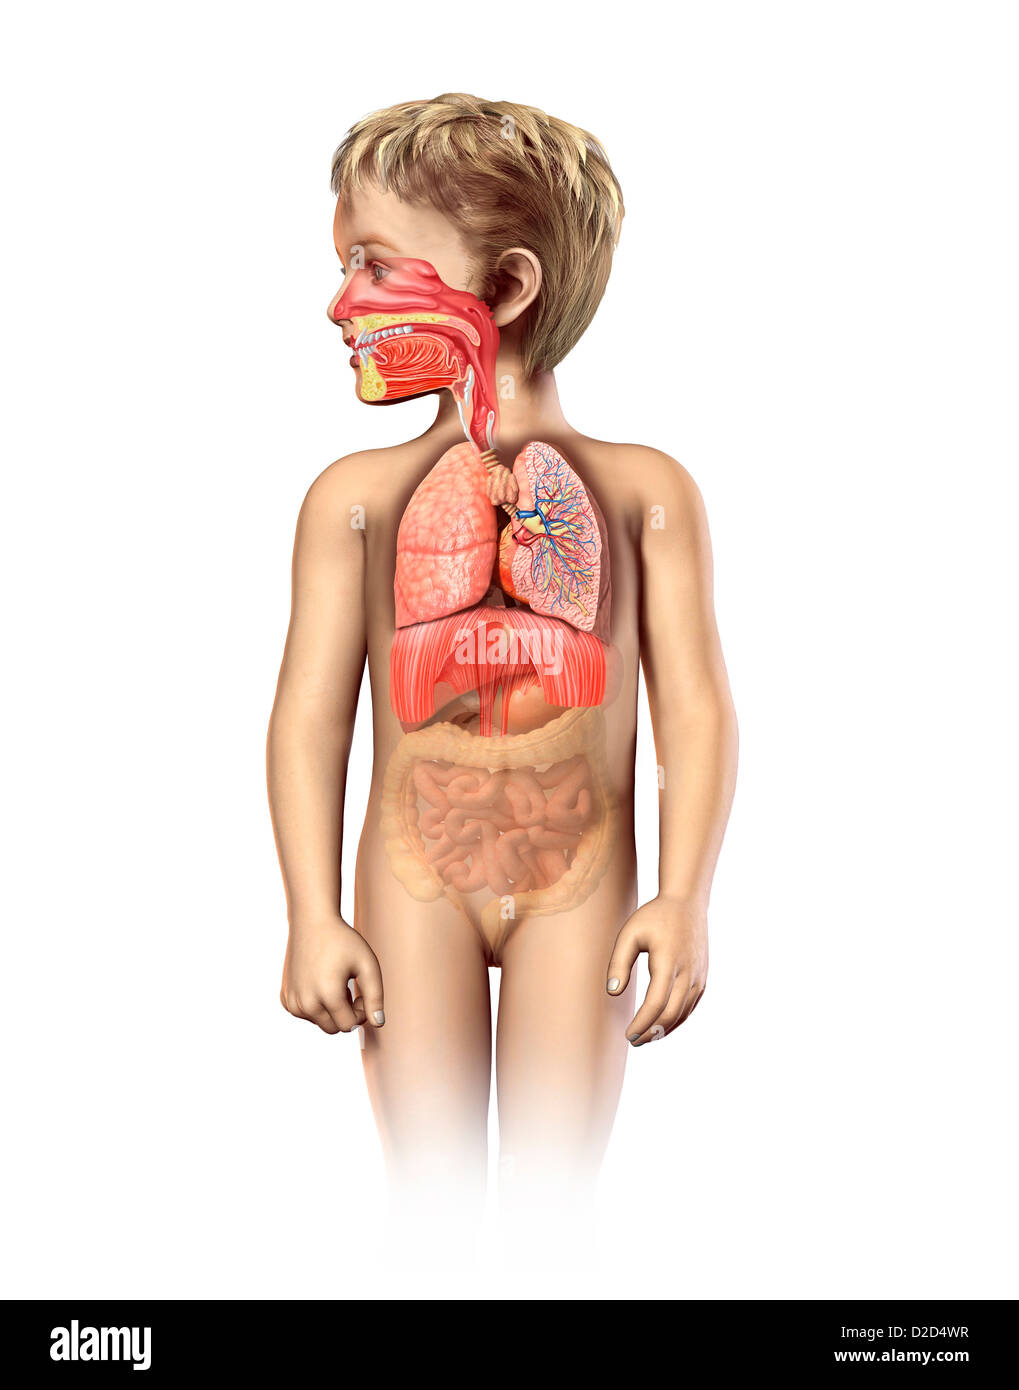 Child's respiratory system computer artwork - Stock Image